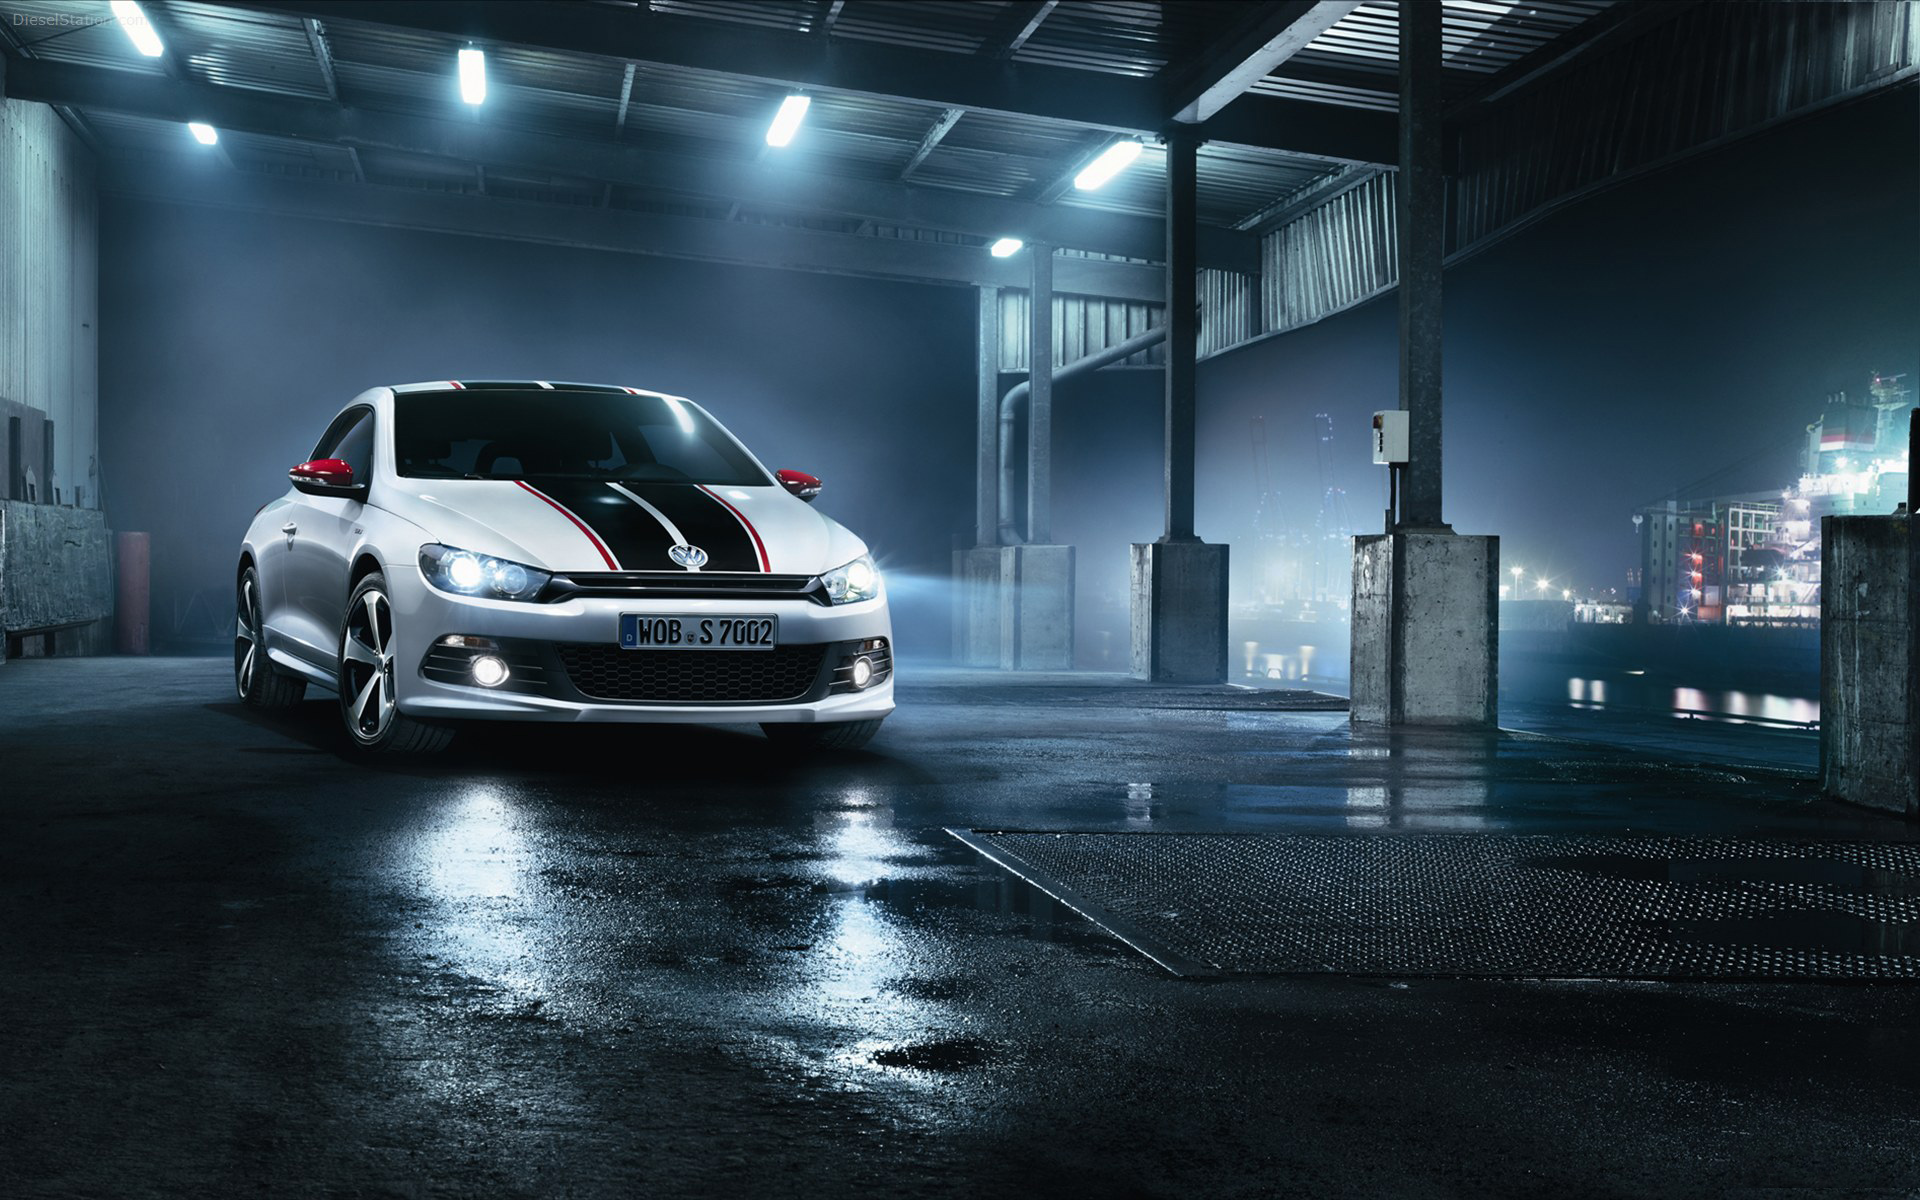 Infiniti Car Logo Wallpaper 2013 Volkswagen Scirocco Gts Wallpaper Hd Car Wallpapers